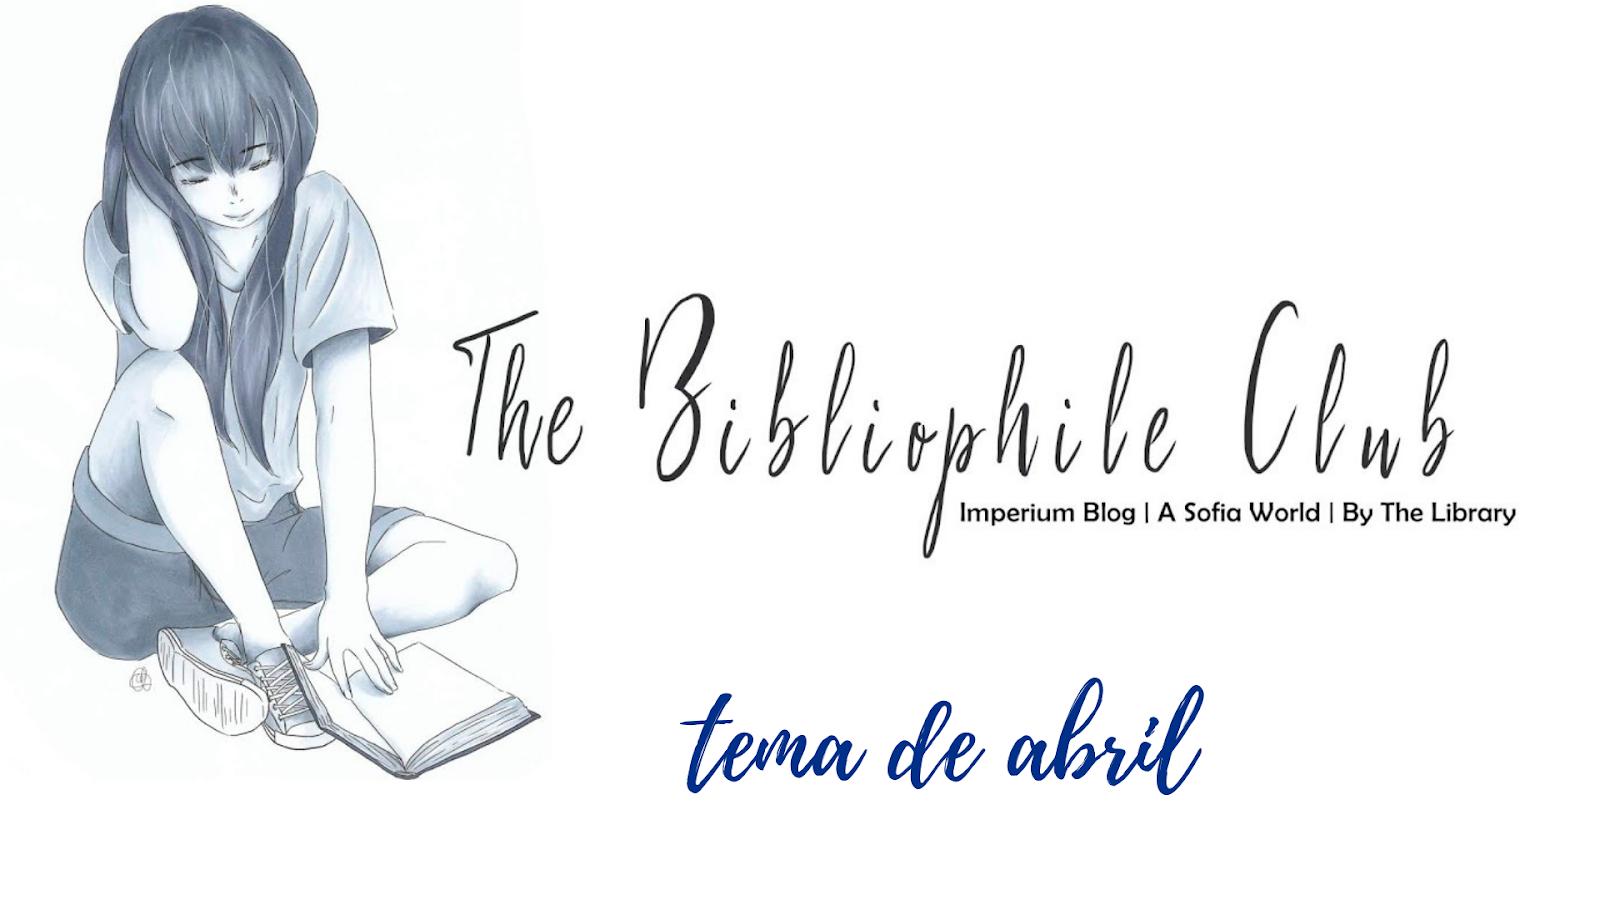 the bibliophile club - tema de abril